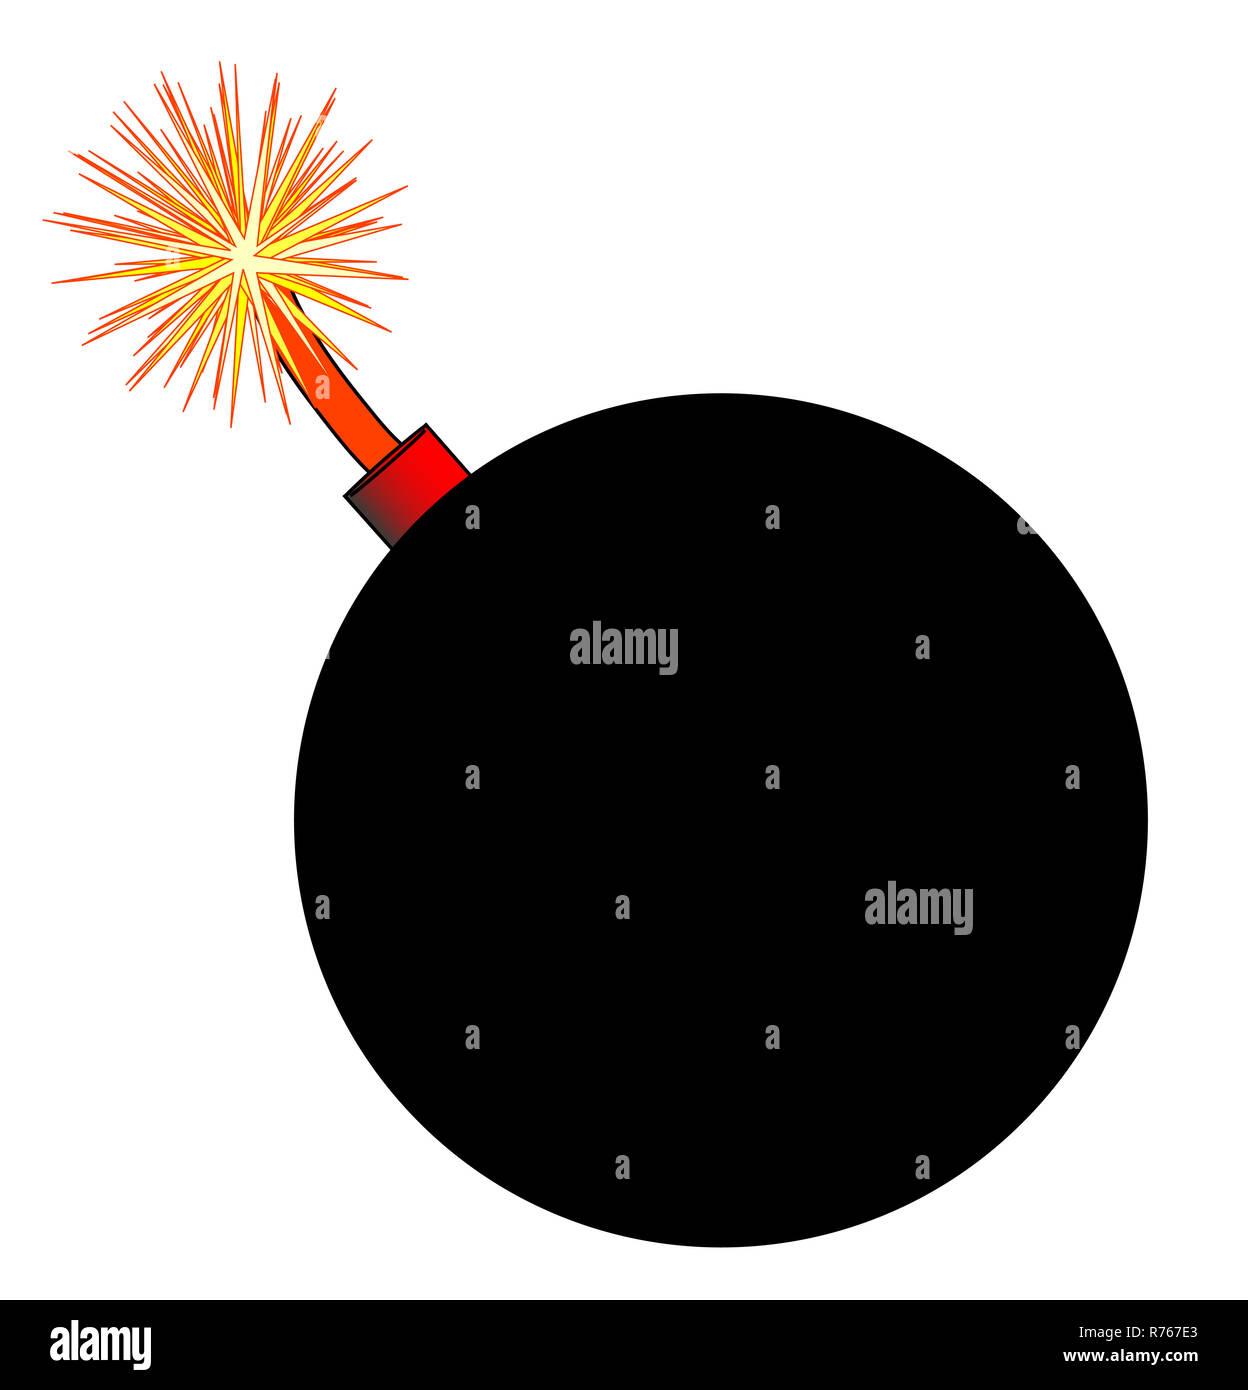 b36e1208cf7fb Old Black Cartoon style Bomb With Lit Fuse - Stock Image